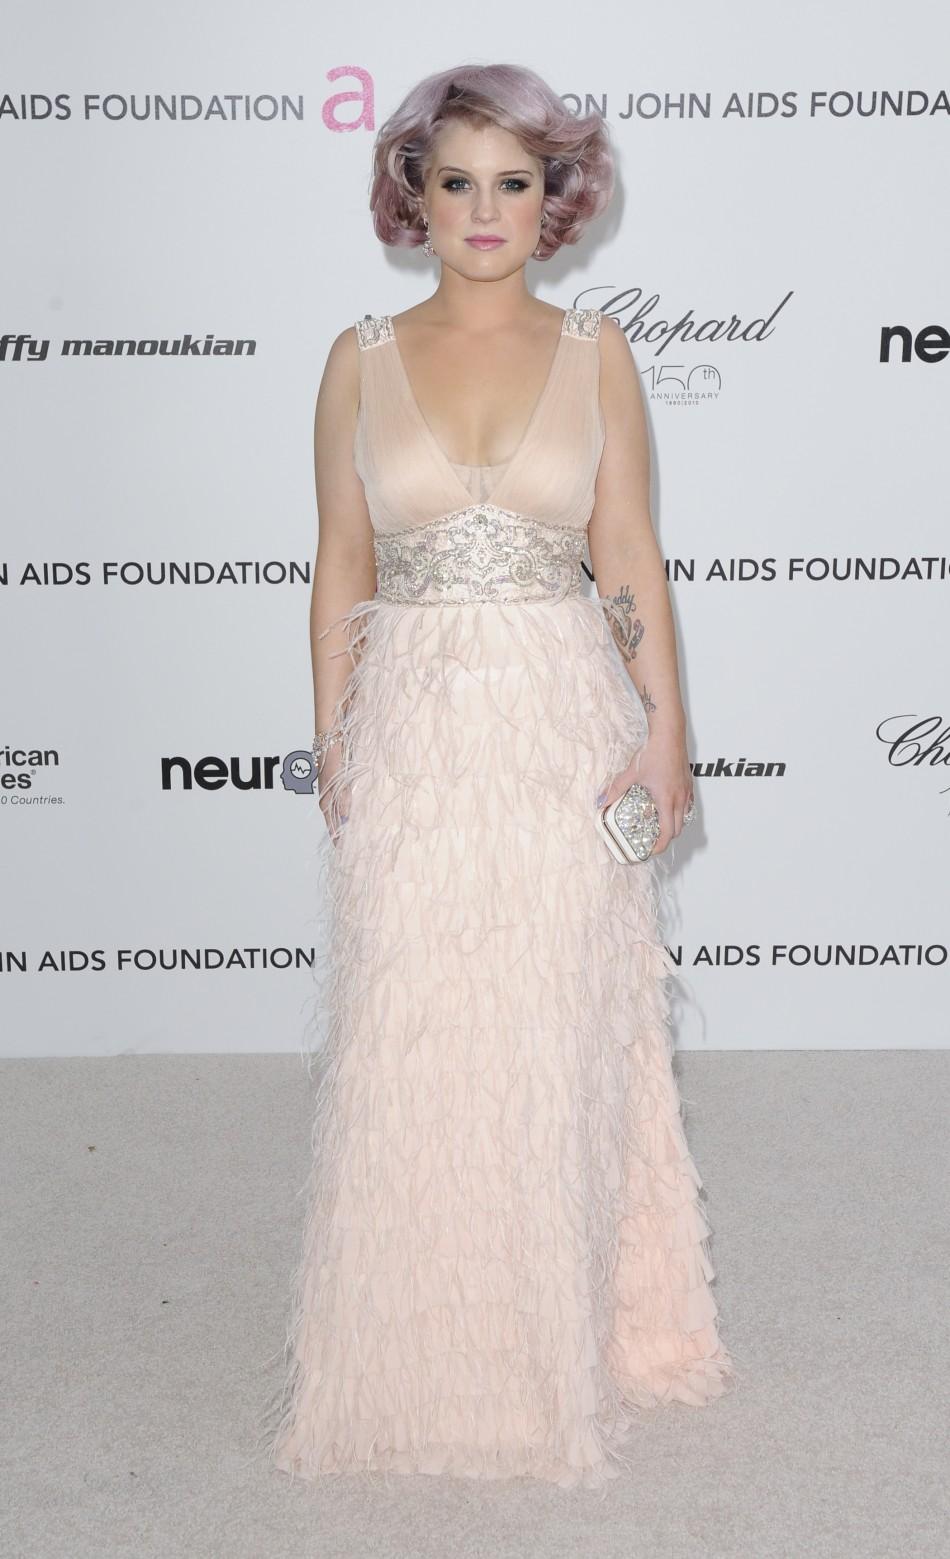 Kelly Osbourne Vs Emma Watson Whos Got The Most Fashion Sense